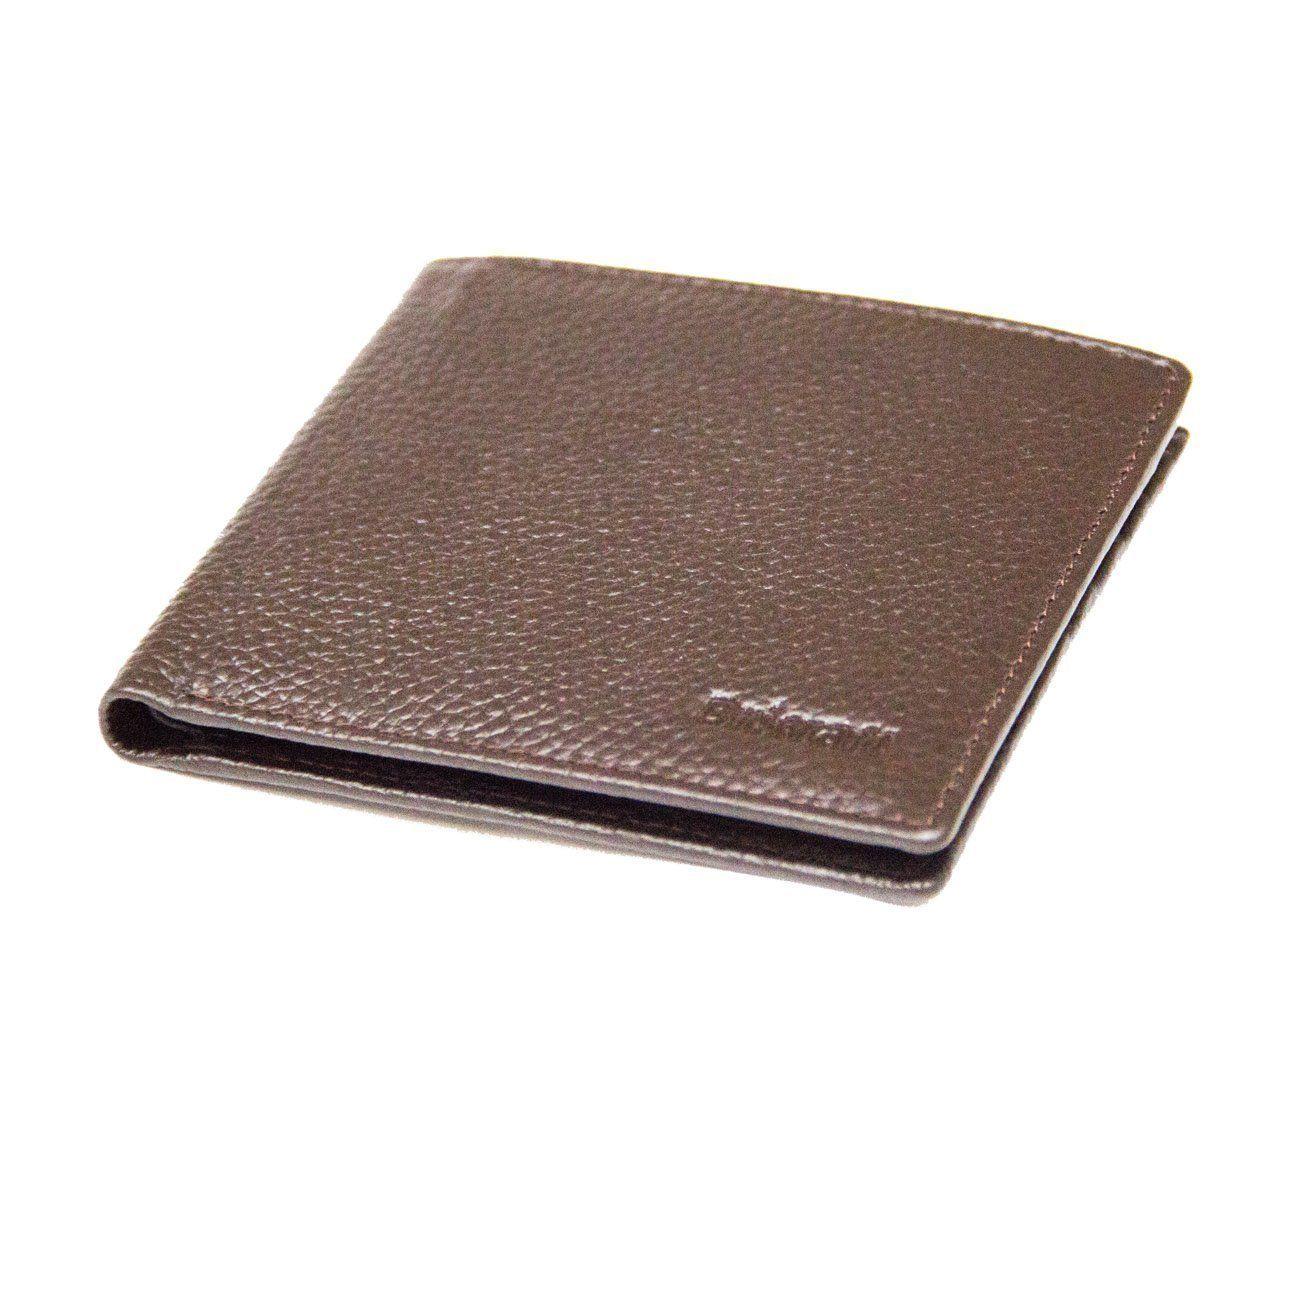 74bb91ec6d8c Bricraft RFID Blocking Wallet for Men, Black Stylish Leather Slim ...